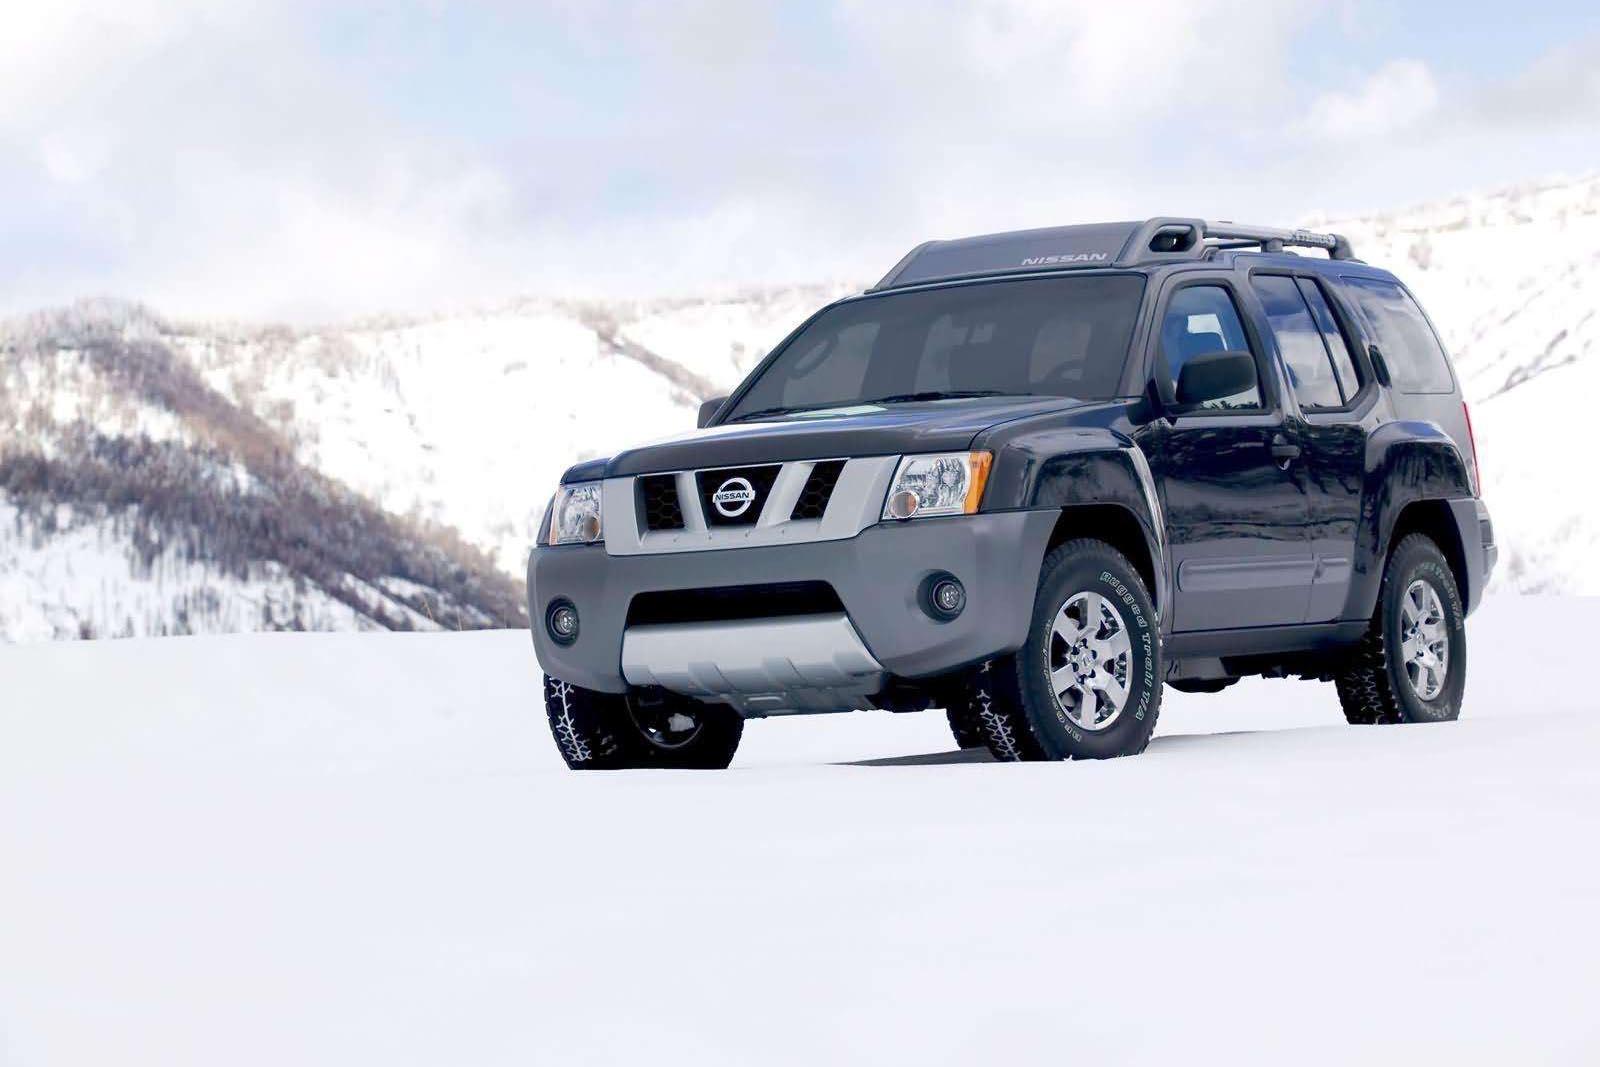 Exceptional 2005 Nissan Xterra. Https://www.autotrader.ca/